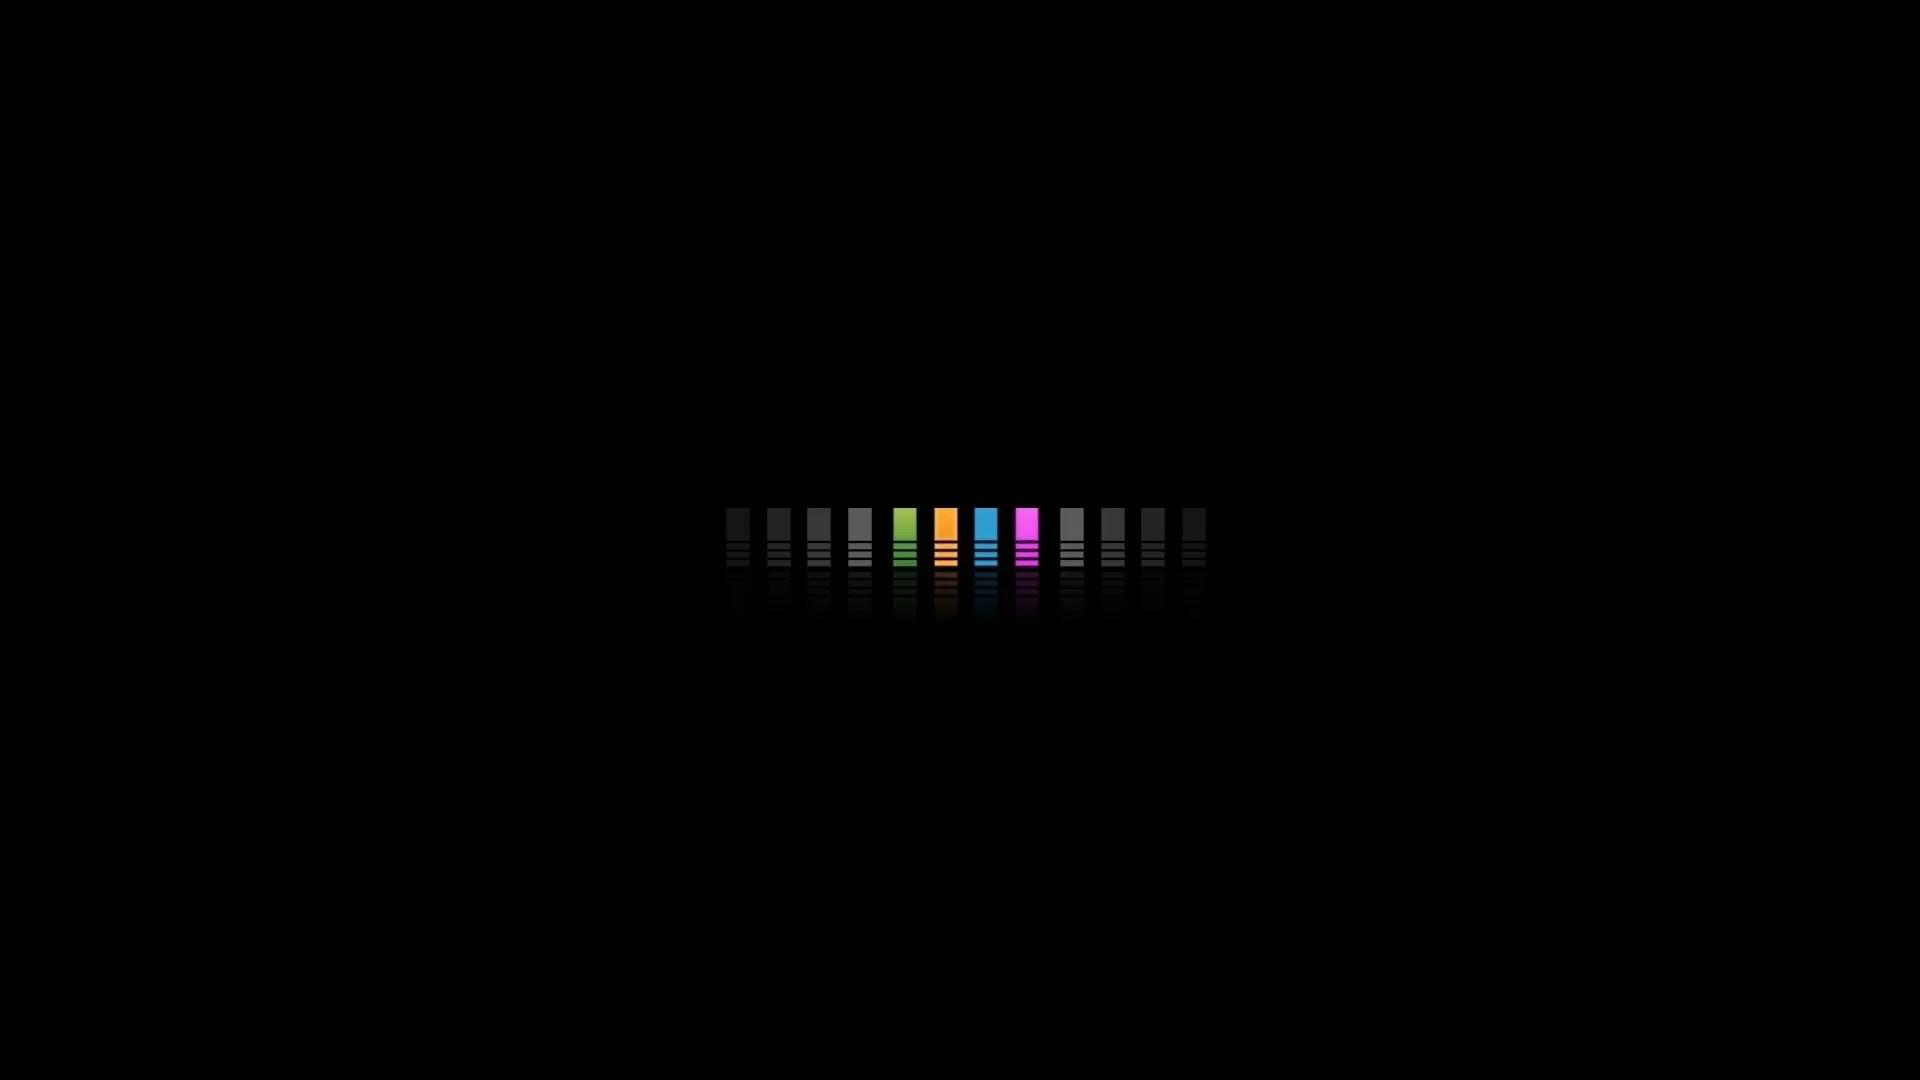 loading Black background